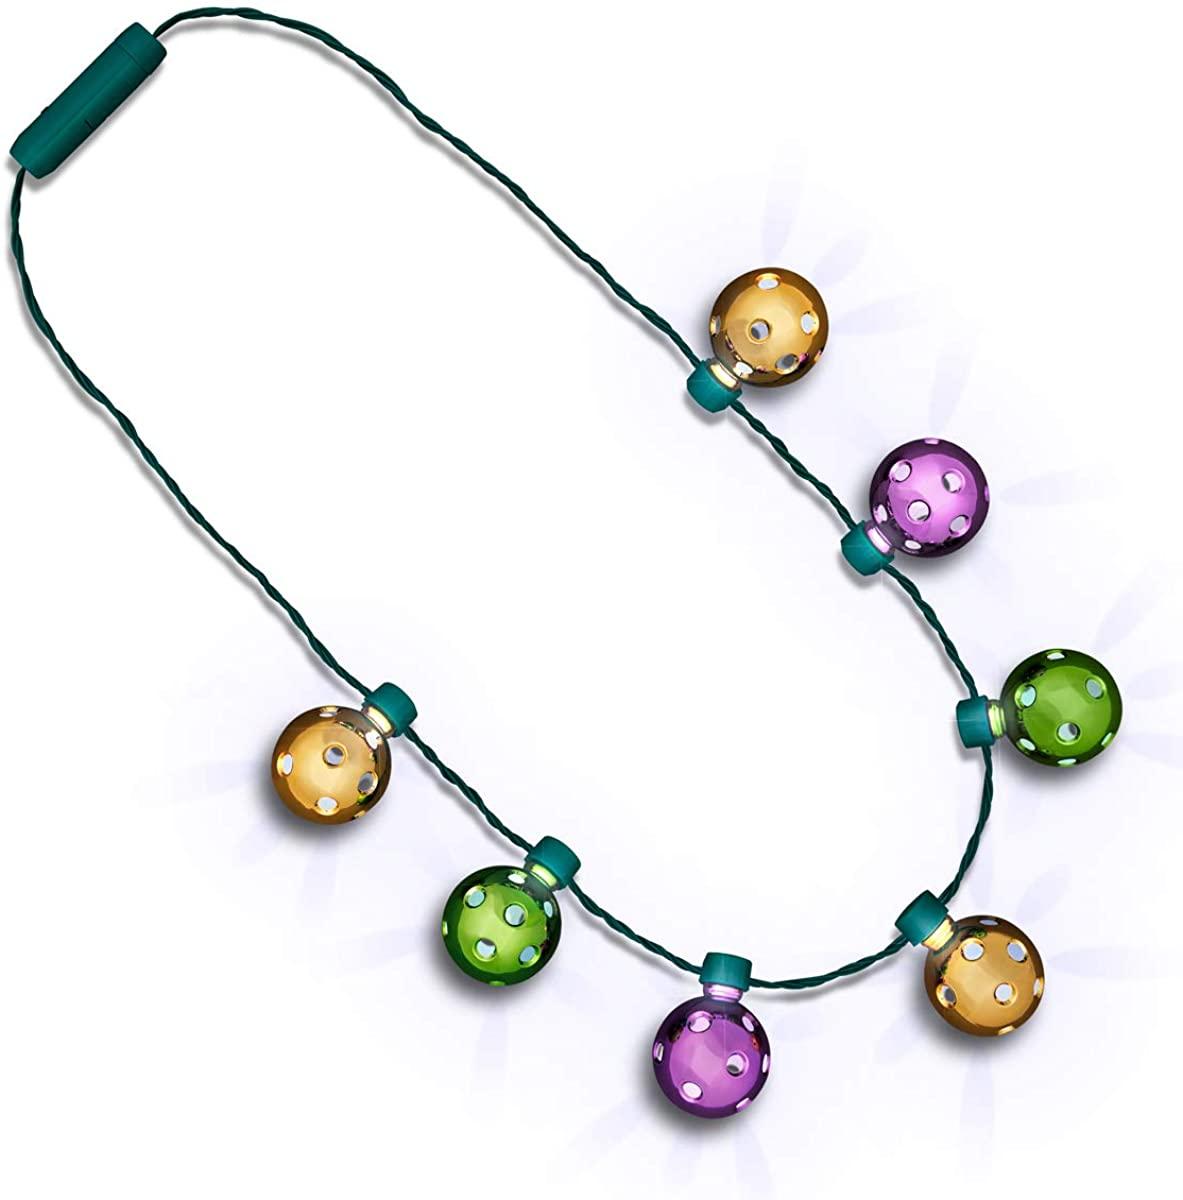 Light Up Disco Lights Mardi Gras Party Necklace